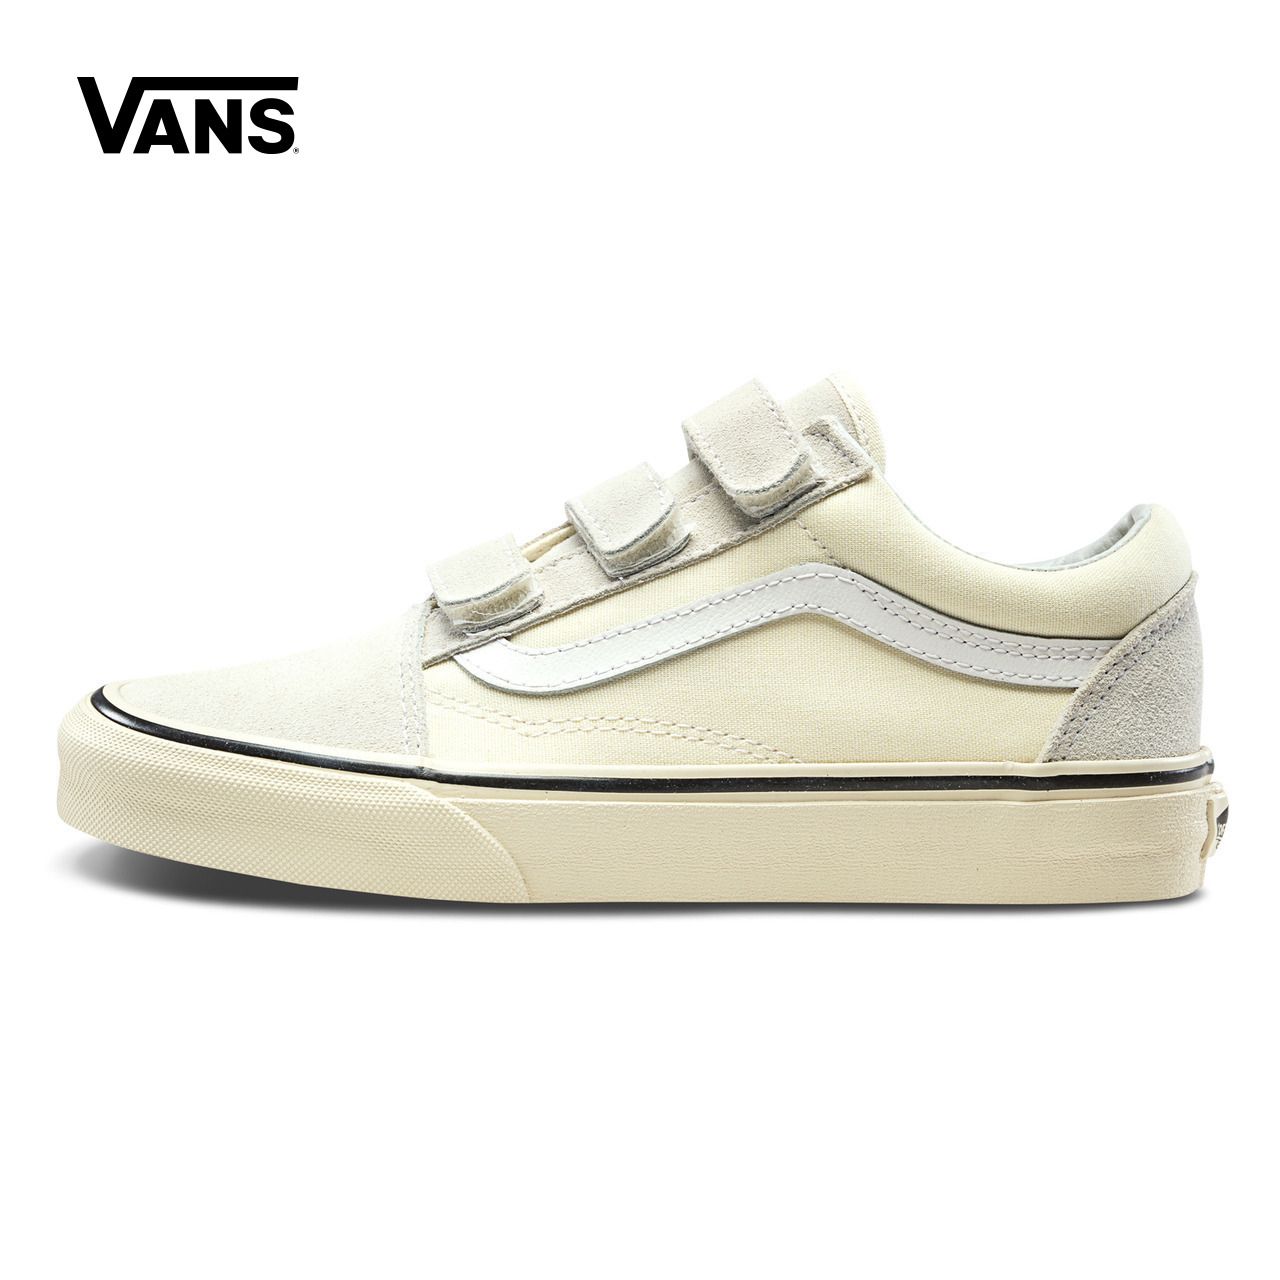 Original New Arrival Vans Men's & Women's Classic Old Skool V Low-top Skateboarding Shoes Outdoor Sneakers Canvas VN0A3D29R2S